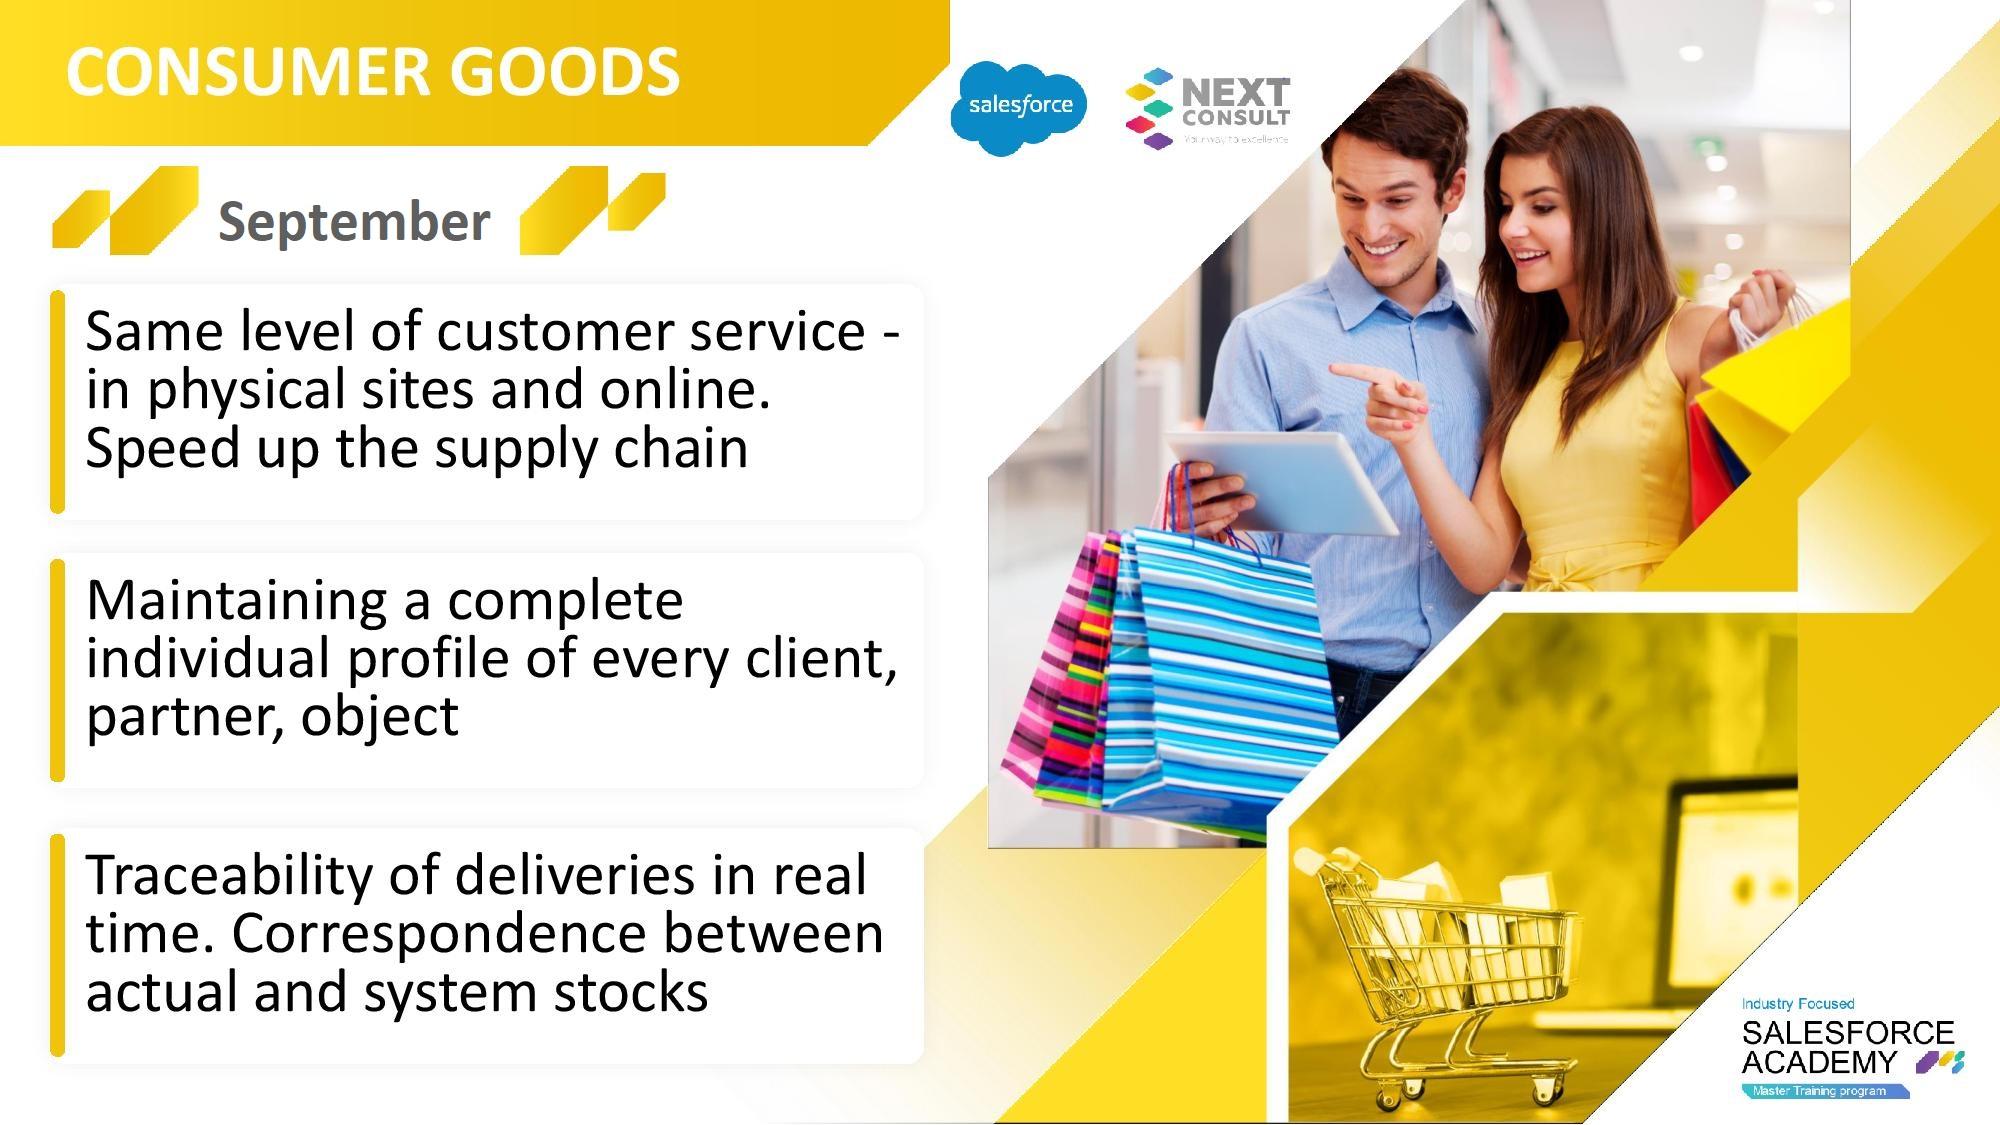 _Salesforce Academy_Goods_Banner-page-001v2